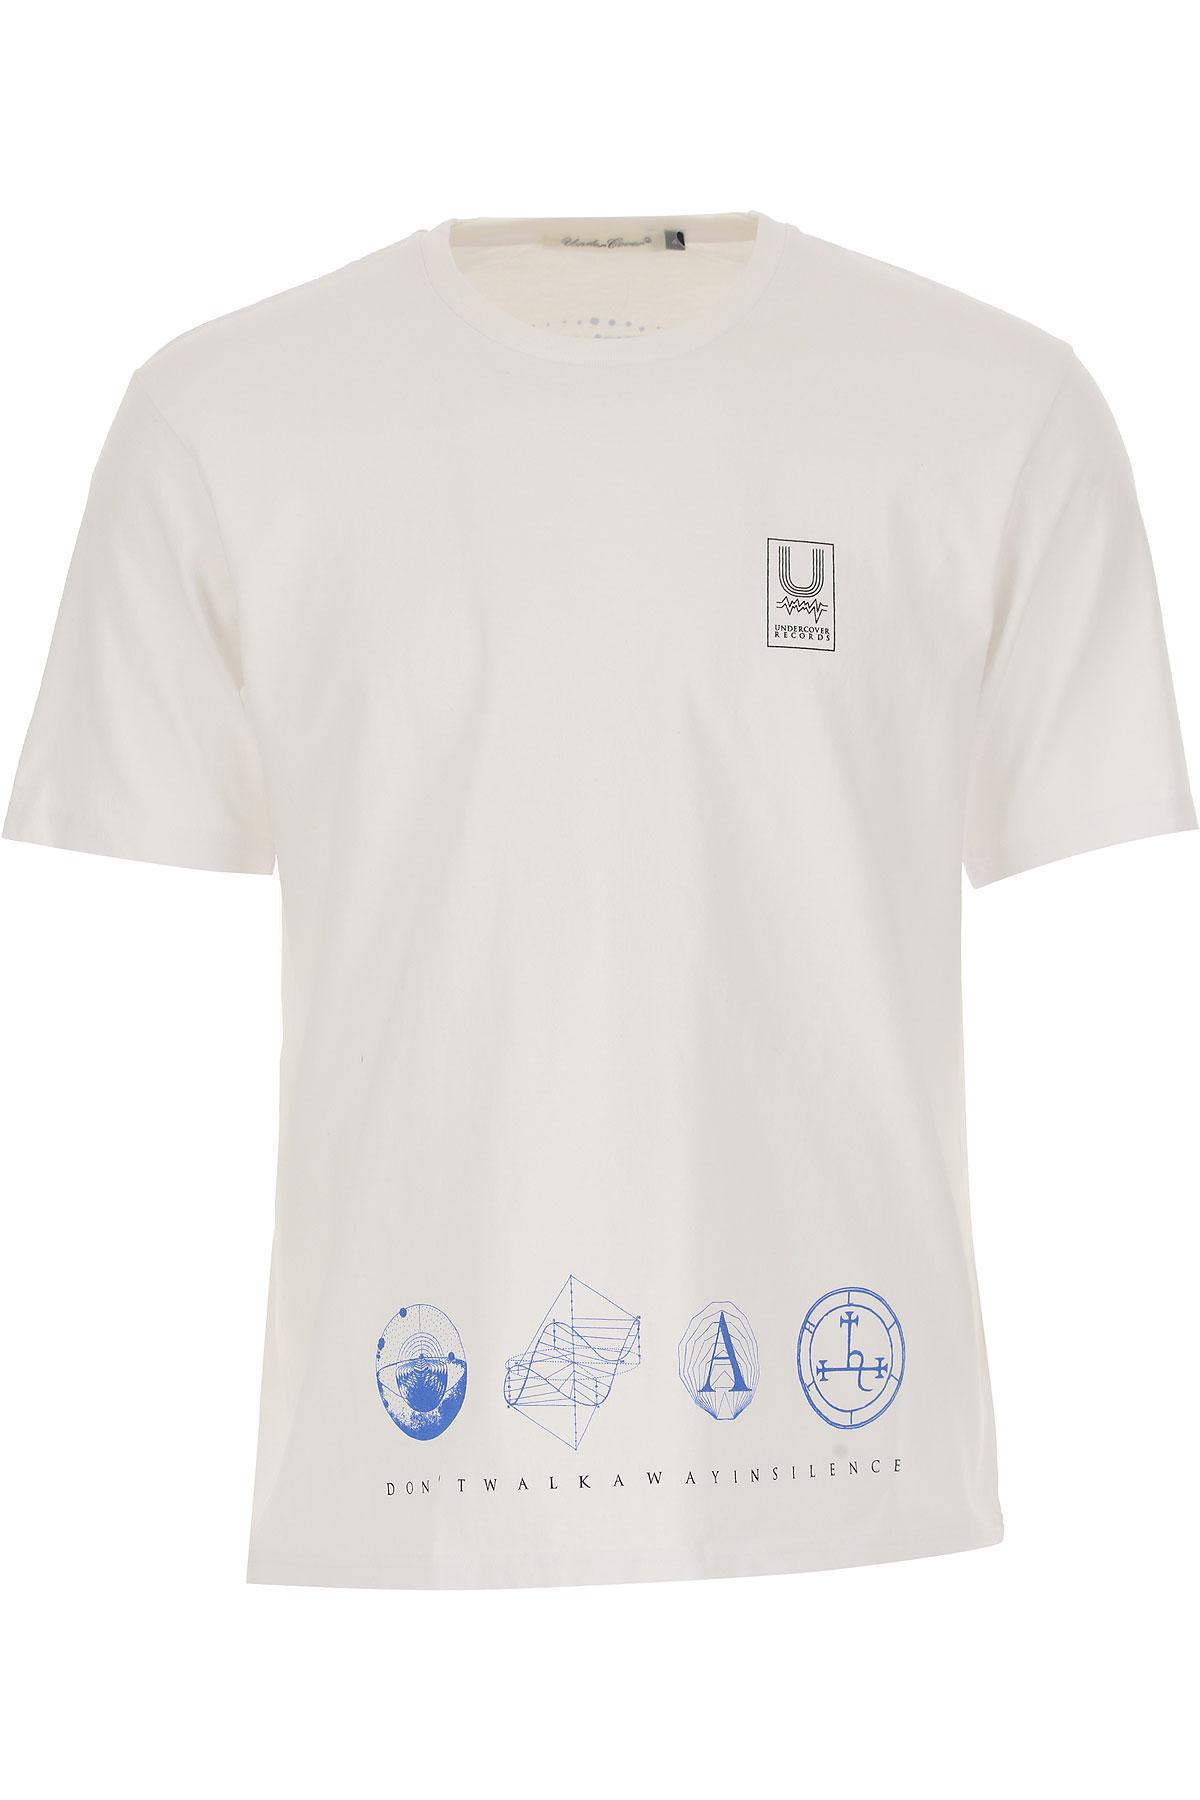 Image of Undercover T-Shirt for Men, White, Cotton, 2017, L XL